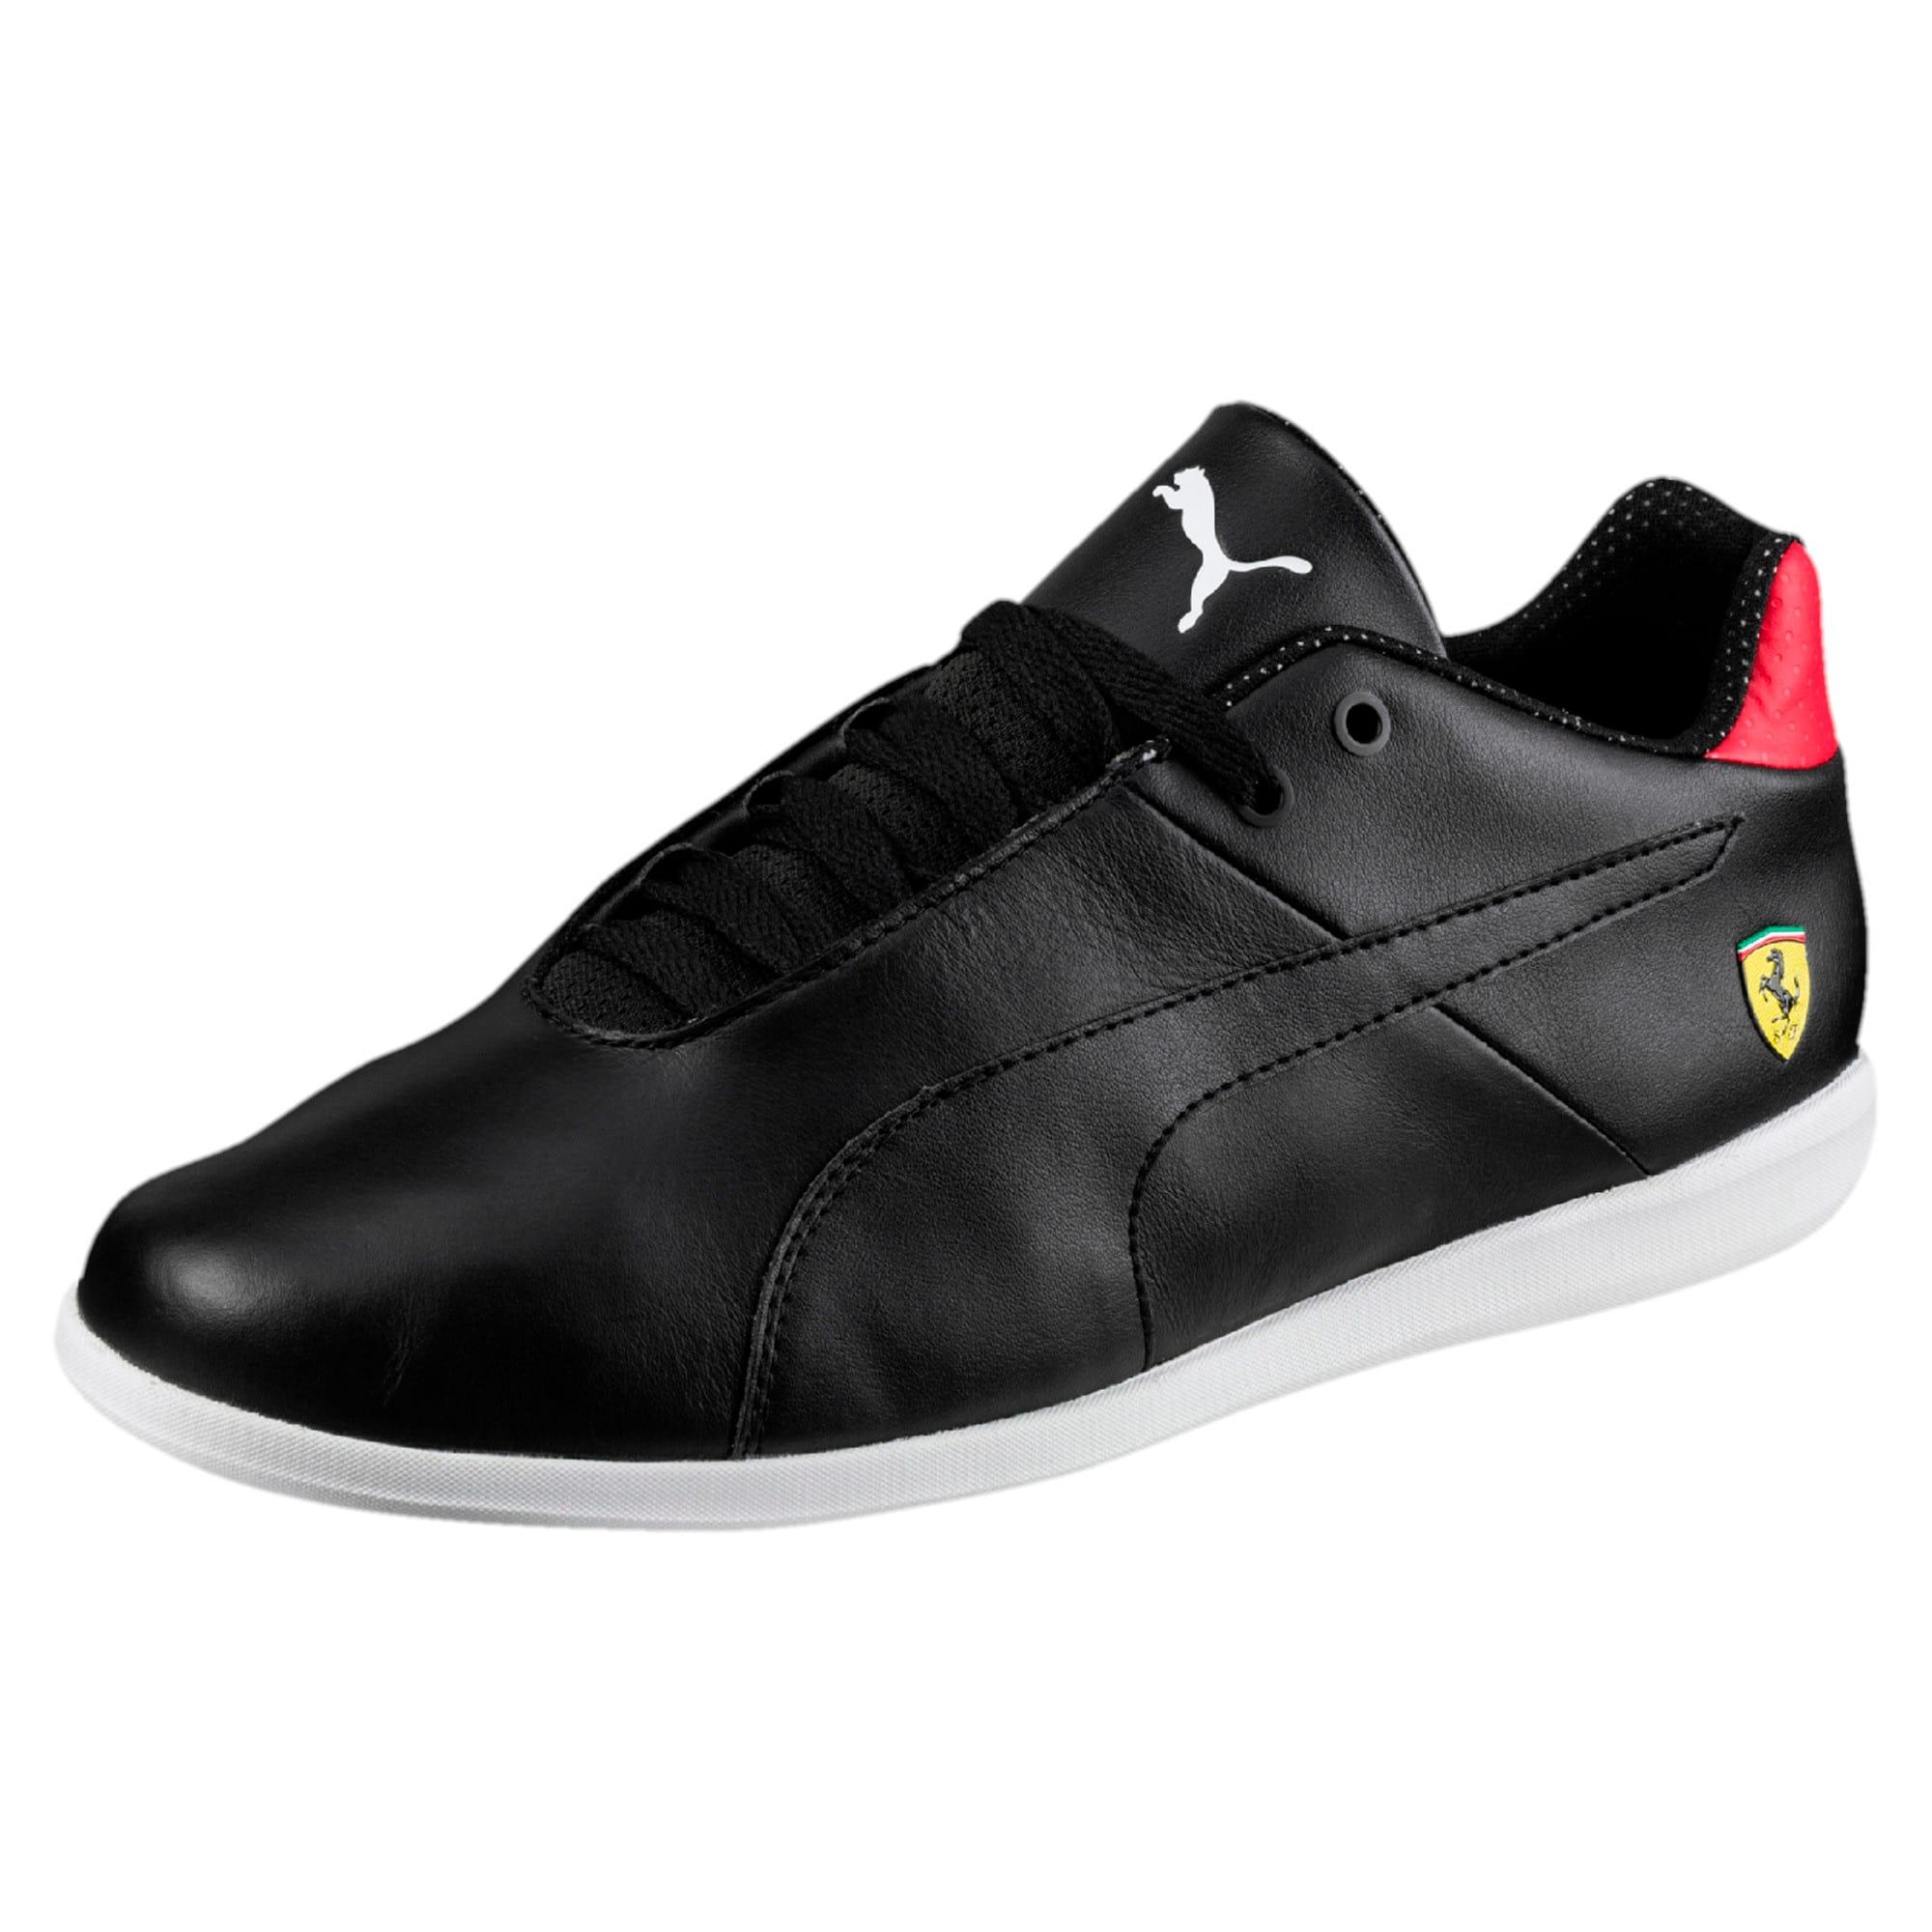 Thumbnail 1 of Ferrari Future Cat Casual Trainers, Puma Black-Blk-Rosso Corsa, medium-IND